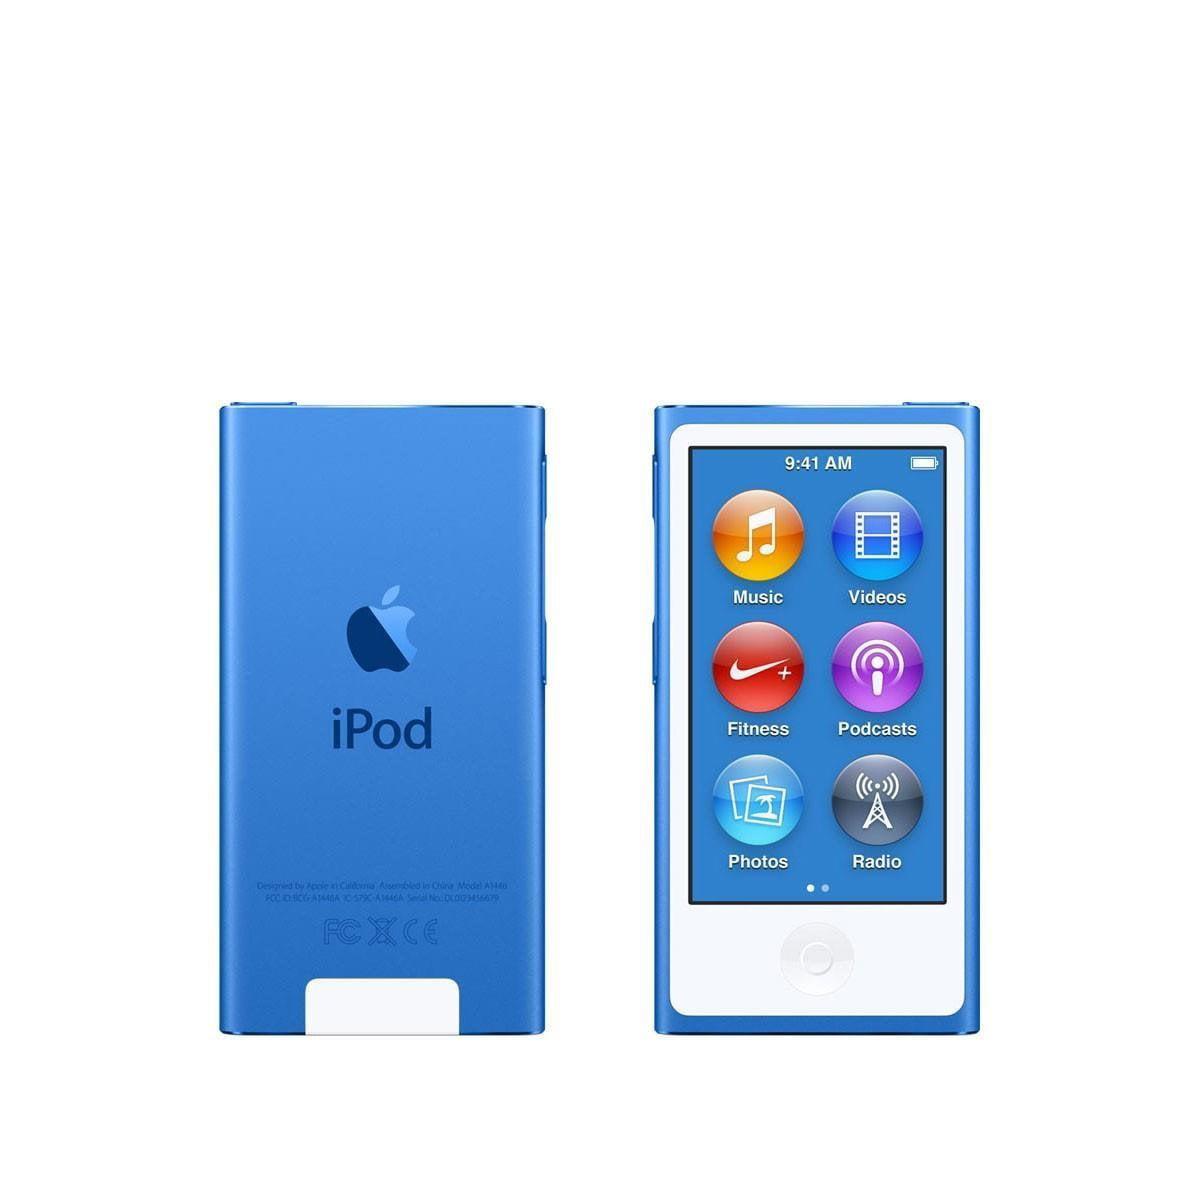 Apple iPod Nano 7th Generation 16GB Blue, (Latest Model)New in Plain White Box MKN02LL/A